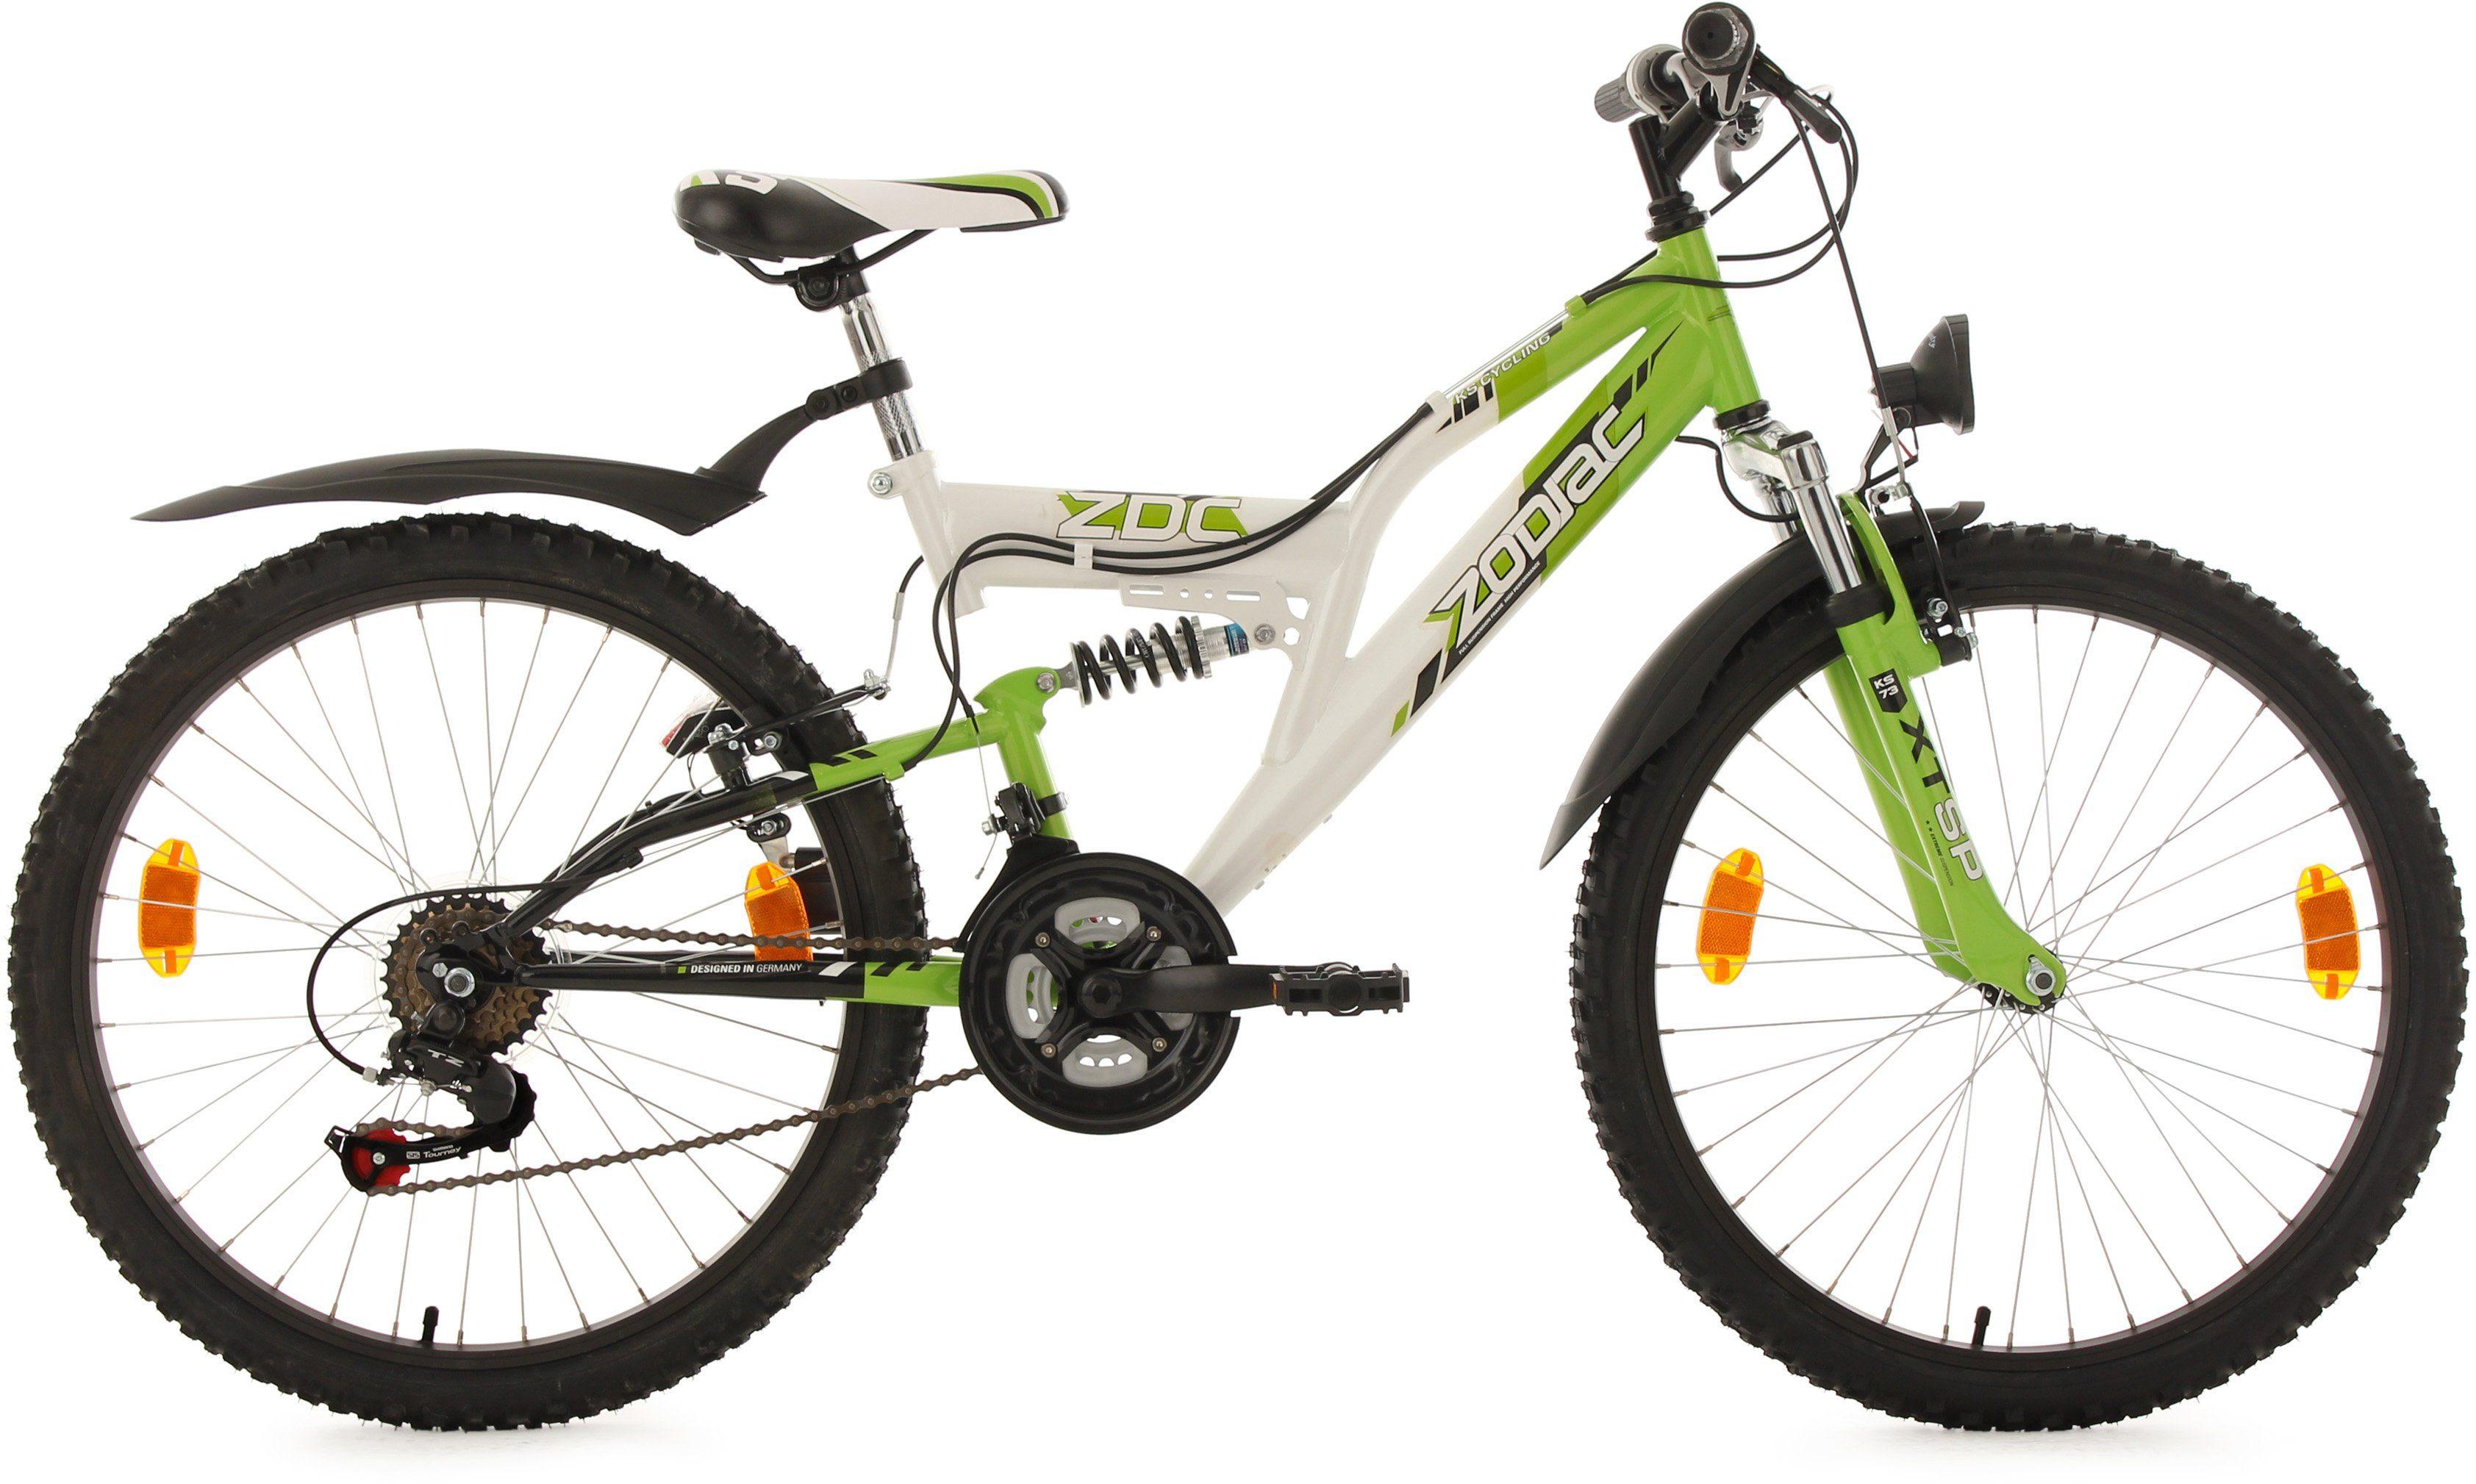 KS Cycling Mountainbike, 24 Zoll, weiß-grün, Shimano 18 Gang-Kettenschaltung, »Zodiac«